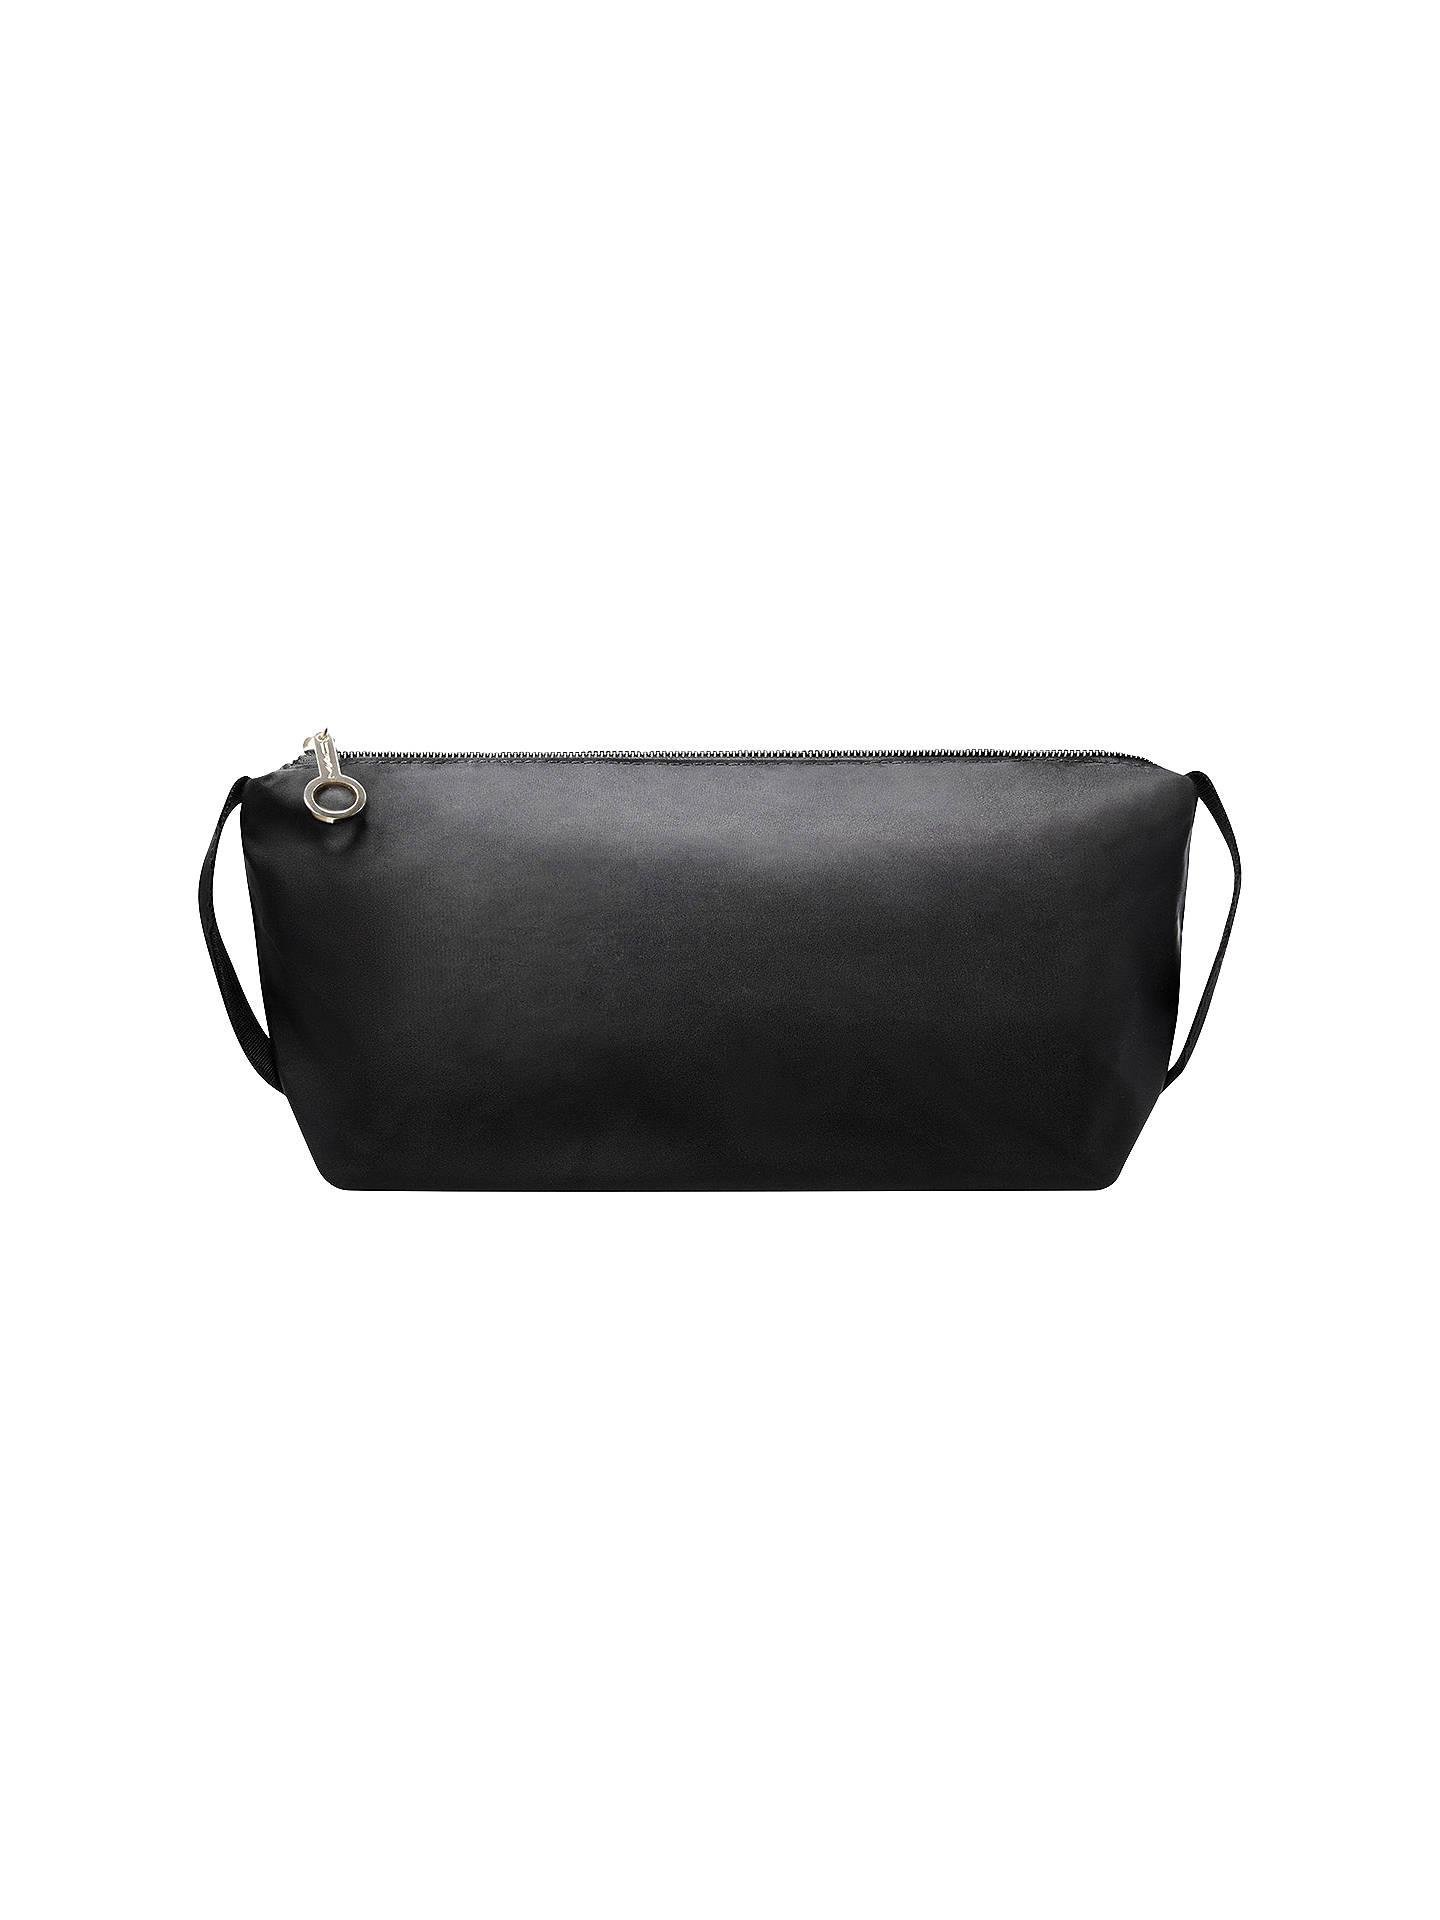 daaeb2a9ed Buy MAC Soft Sac Large Wash Bag, Black Online at johnlewis.com ...